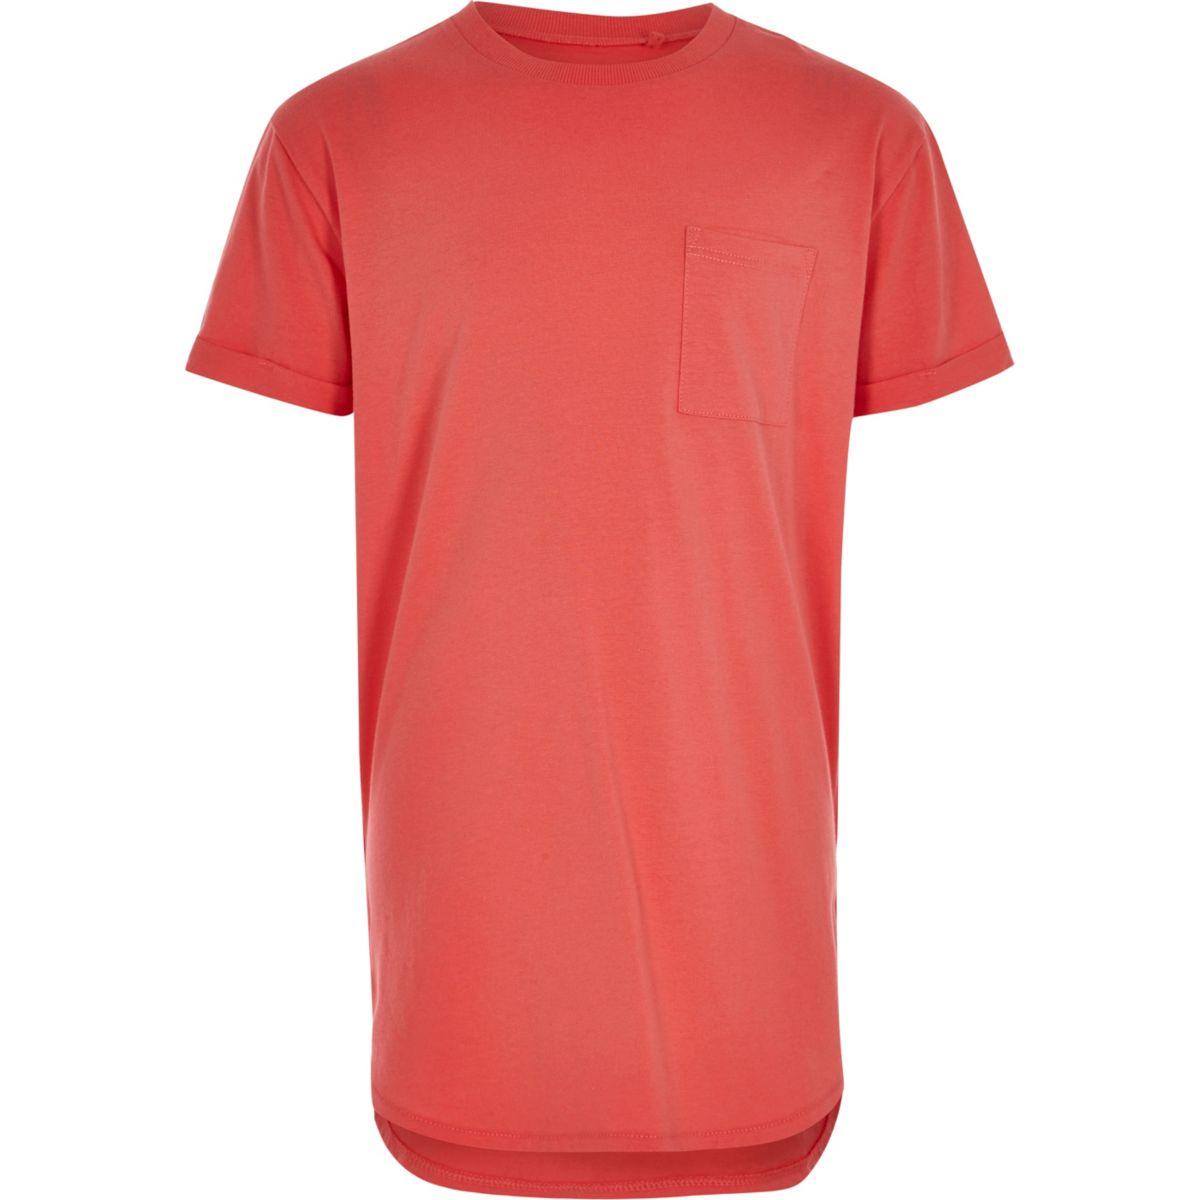 Boys coral pink curved hem T-shirt